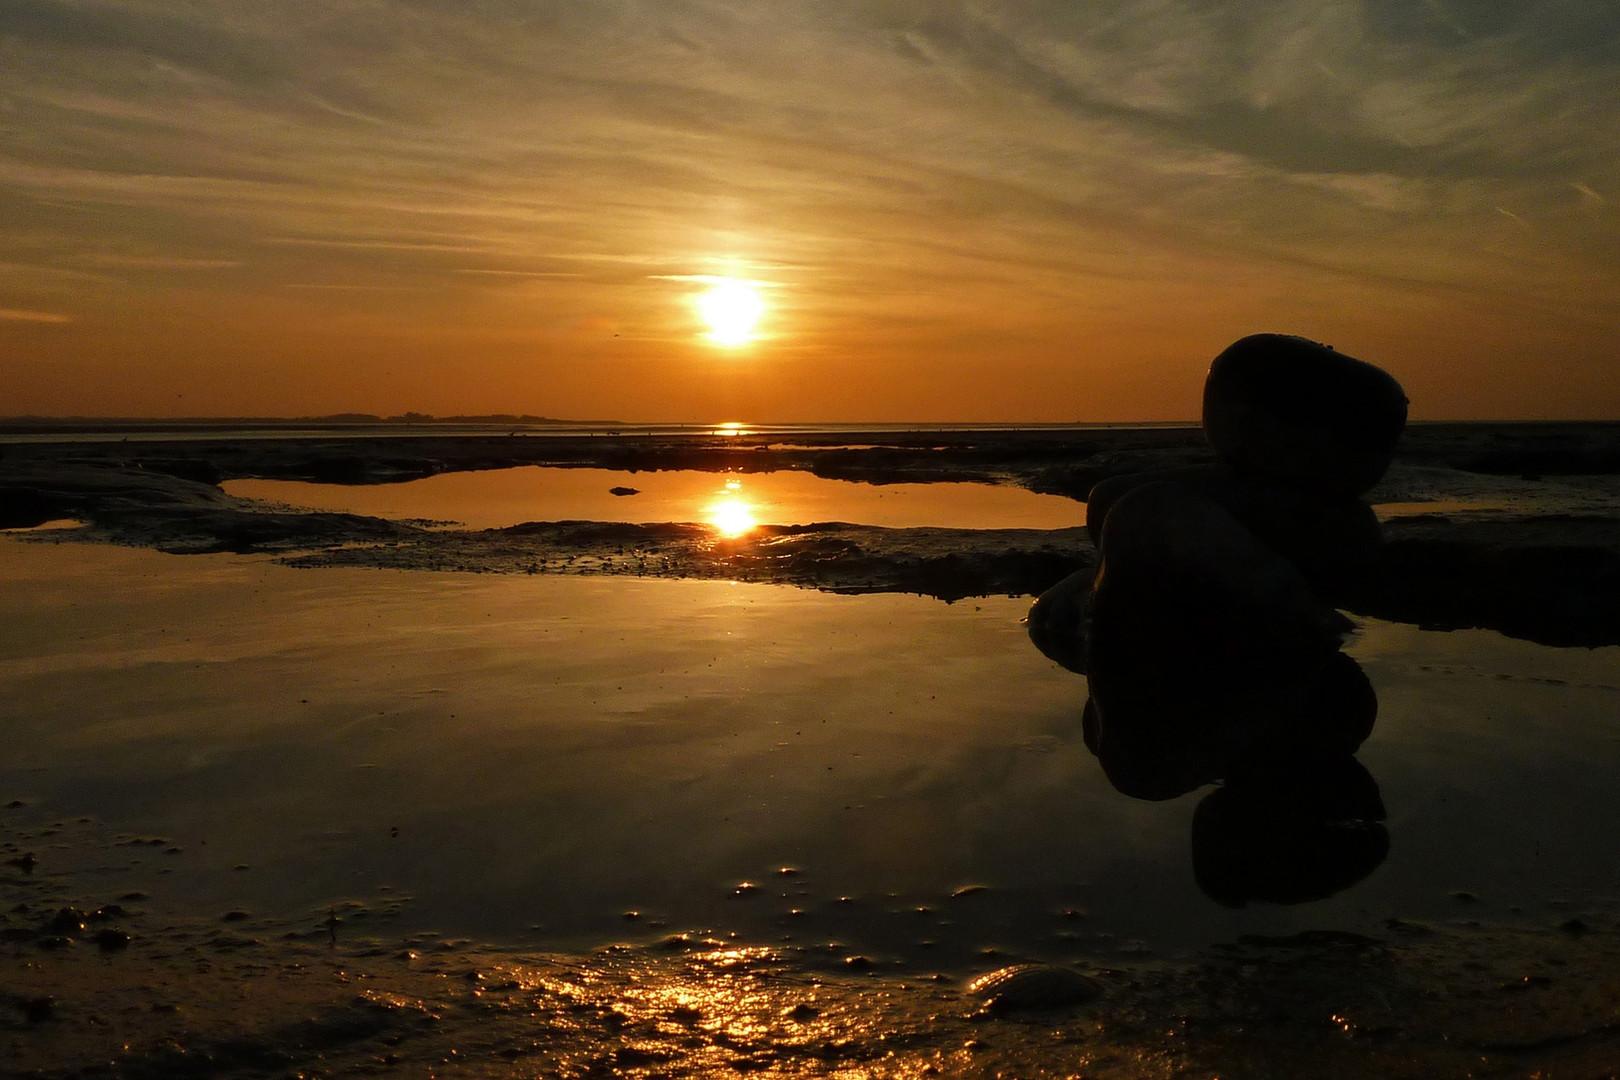 sunset-2793827 (1).jpg